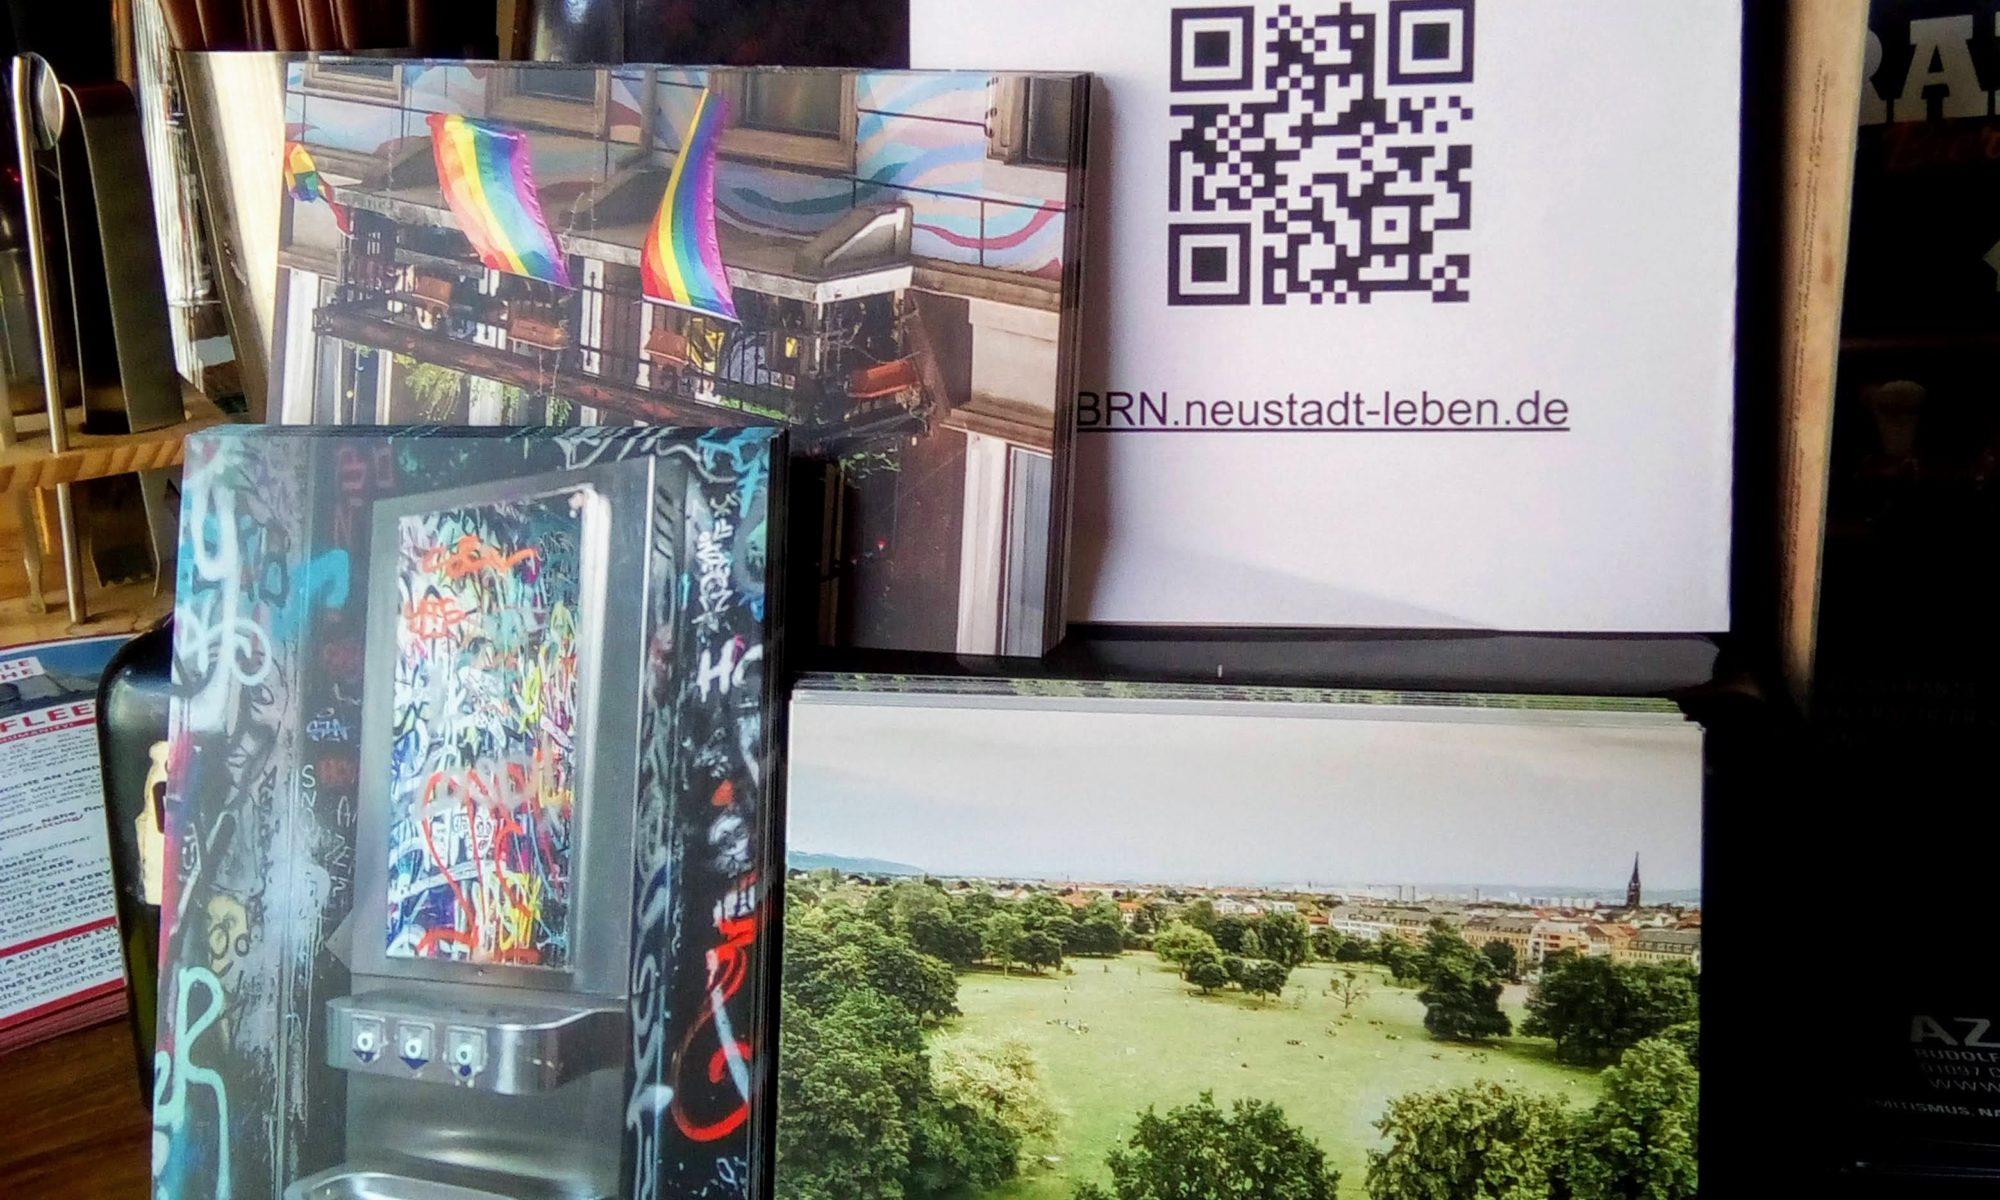 Postkarten der Dresdner Neustadt